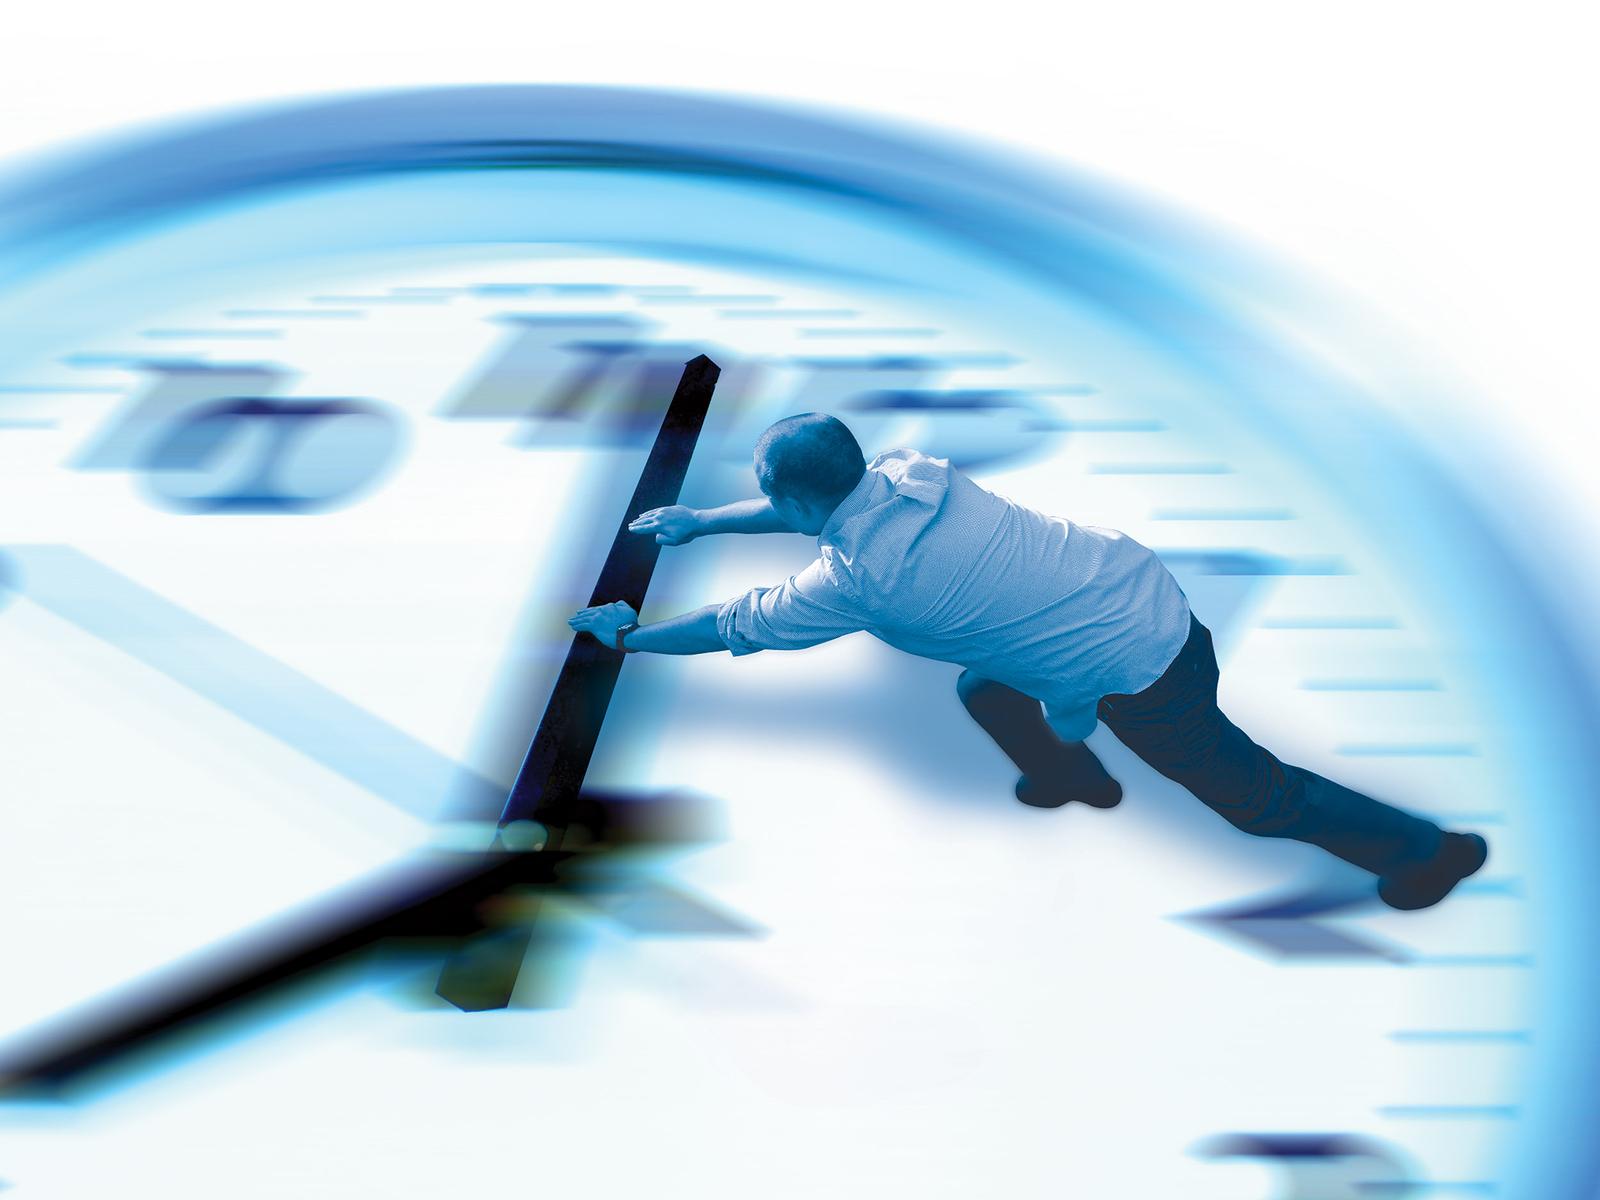 http://englishlanguageliterature.files.wordpress.com/2011/02/bigstockphoto_turn_back_time_10456.jpg